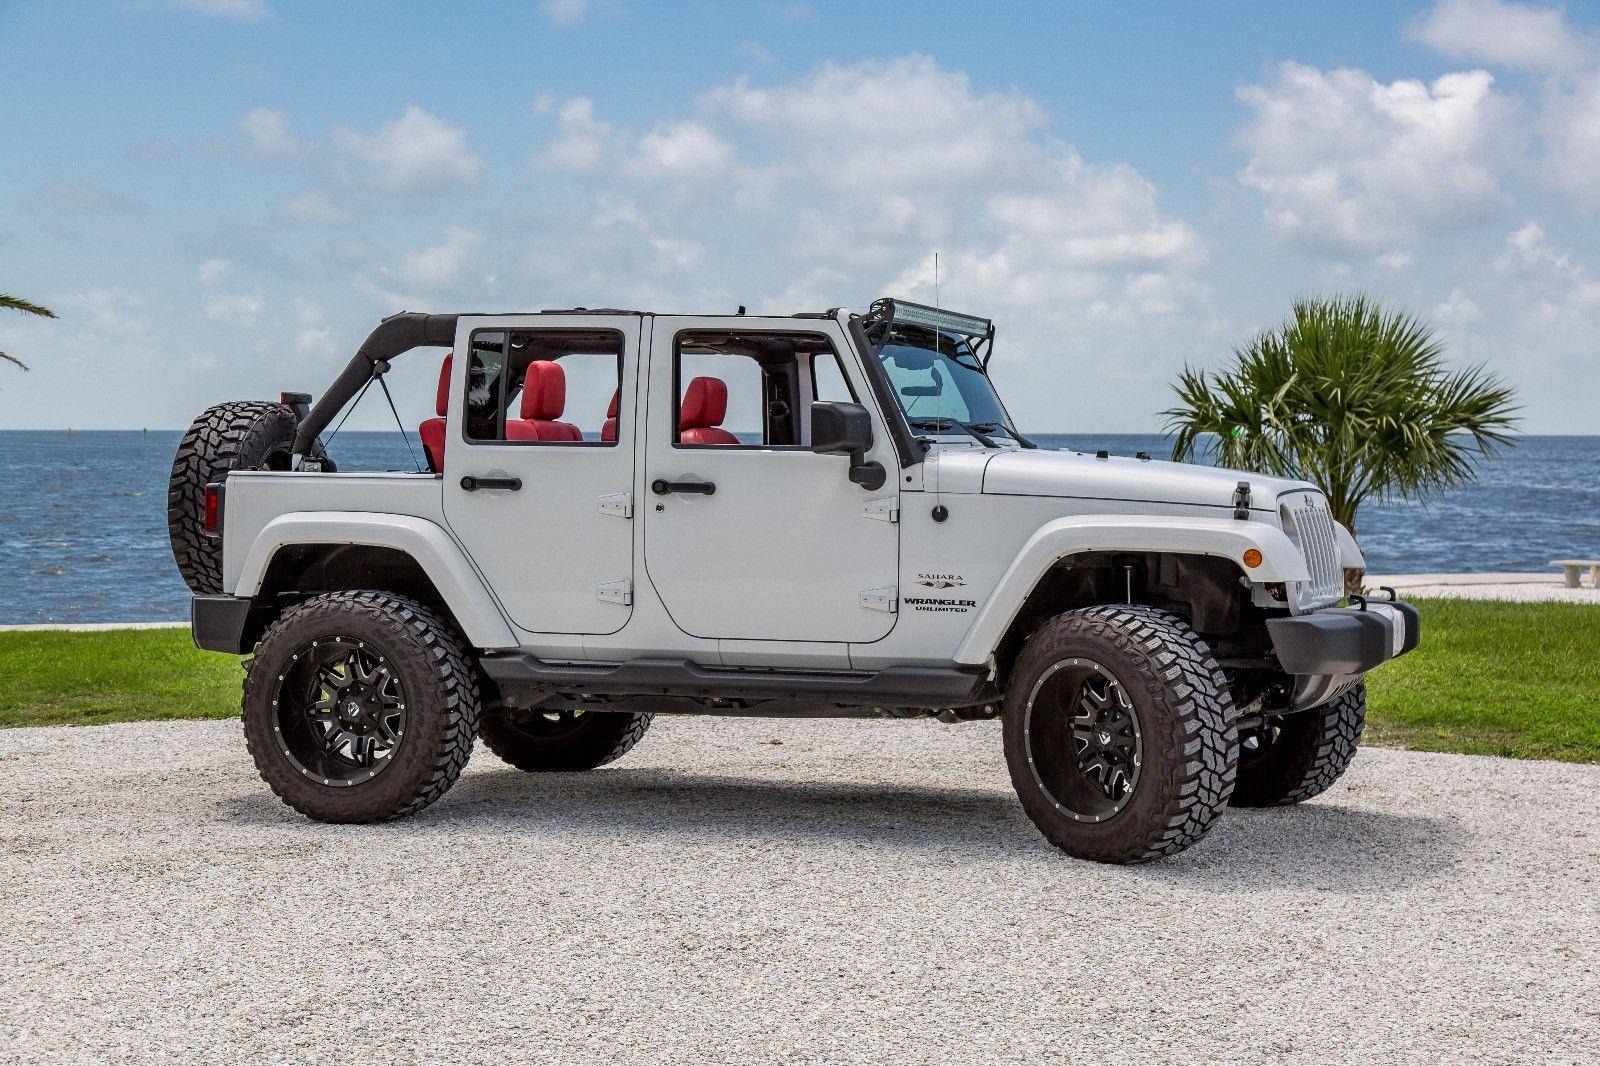 2016 Jeep Wrangler Sahara >> Awesome 2016 Jeep Wrangler Sahara 2016 Jeep Wrangler 2019